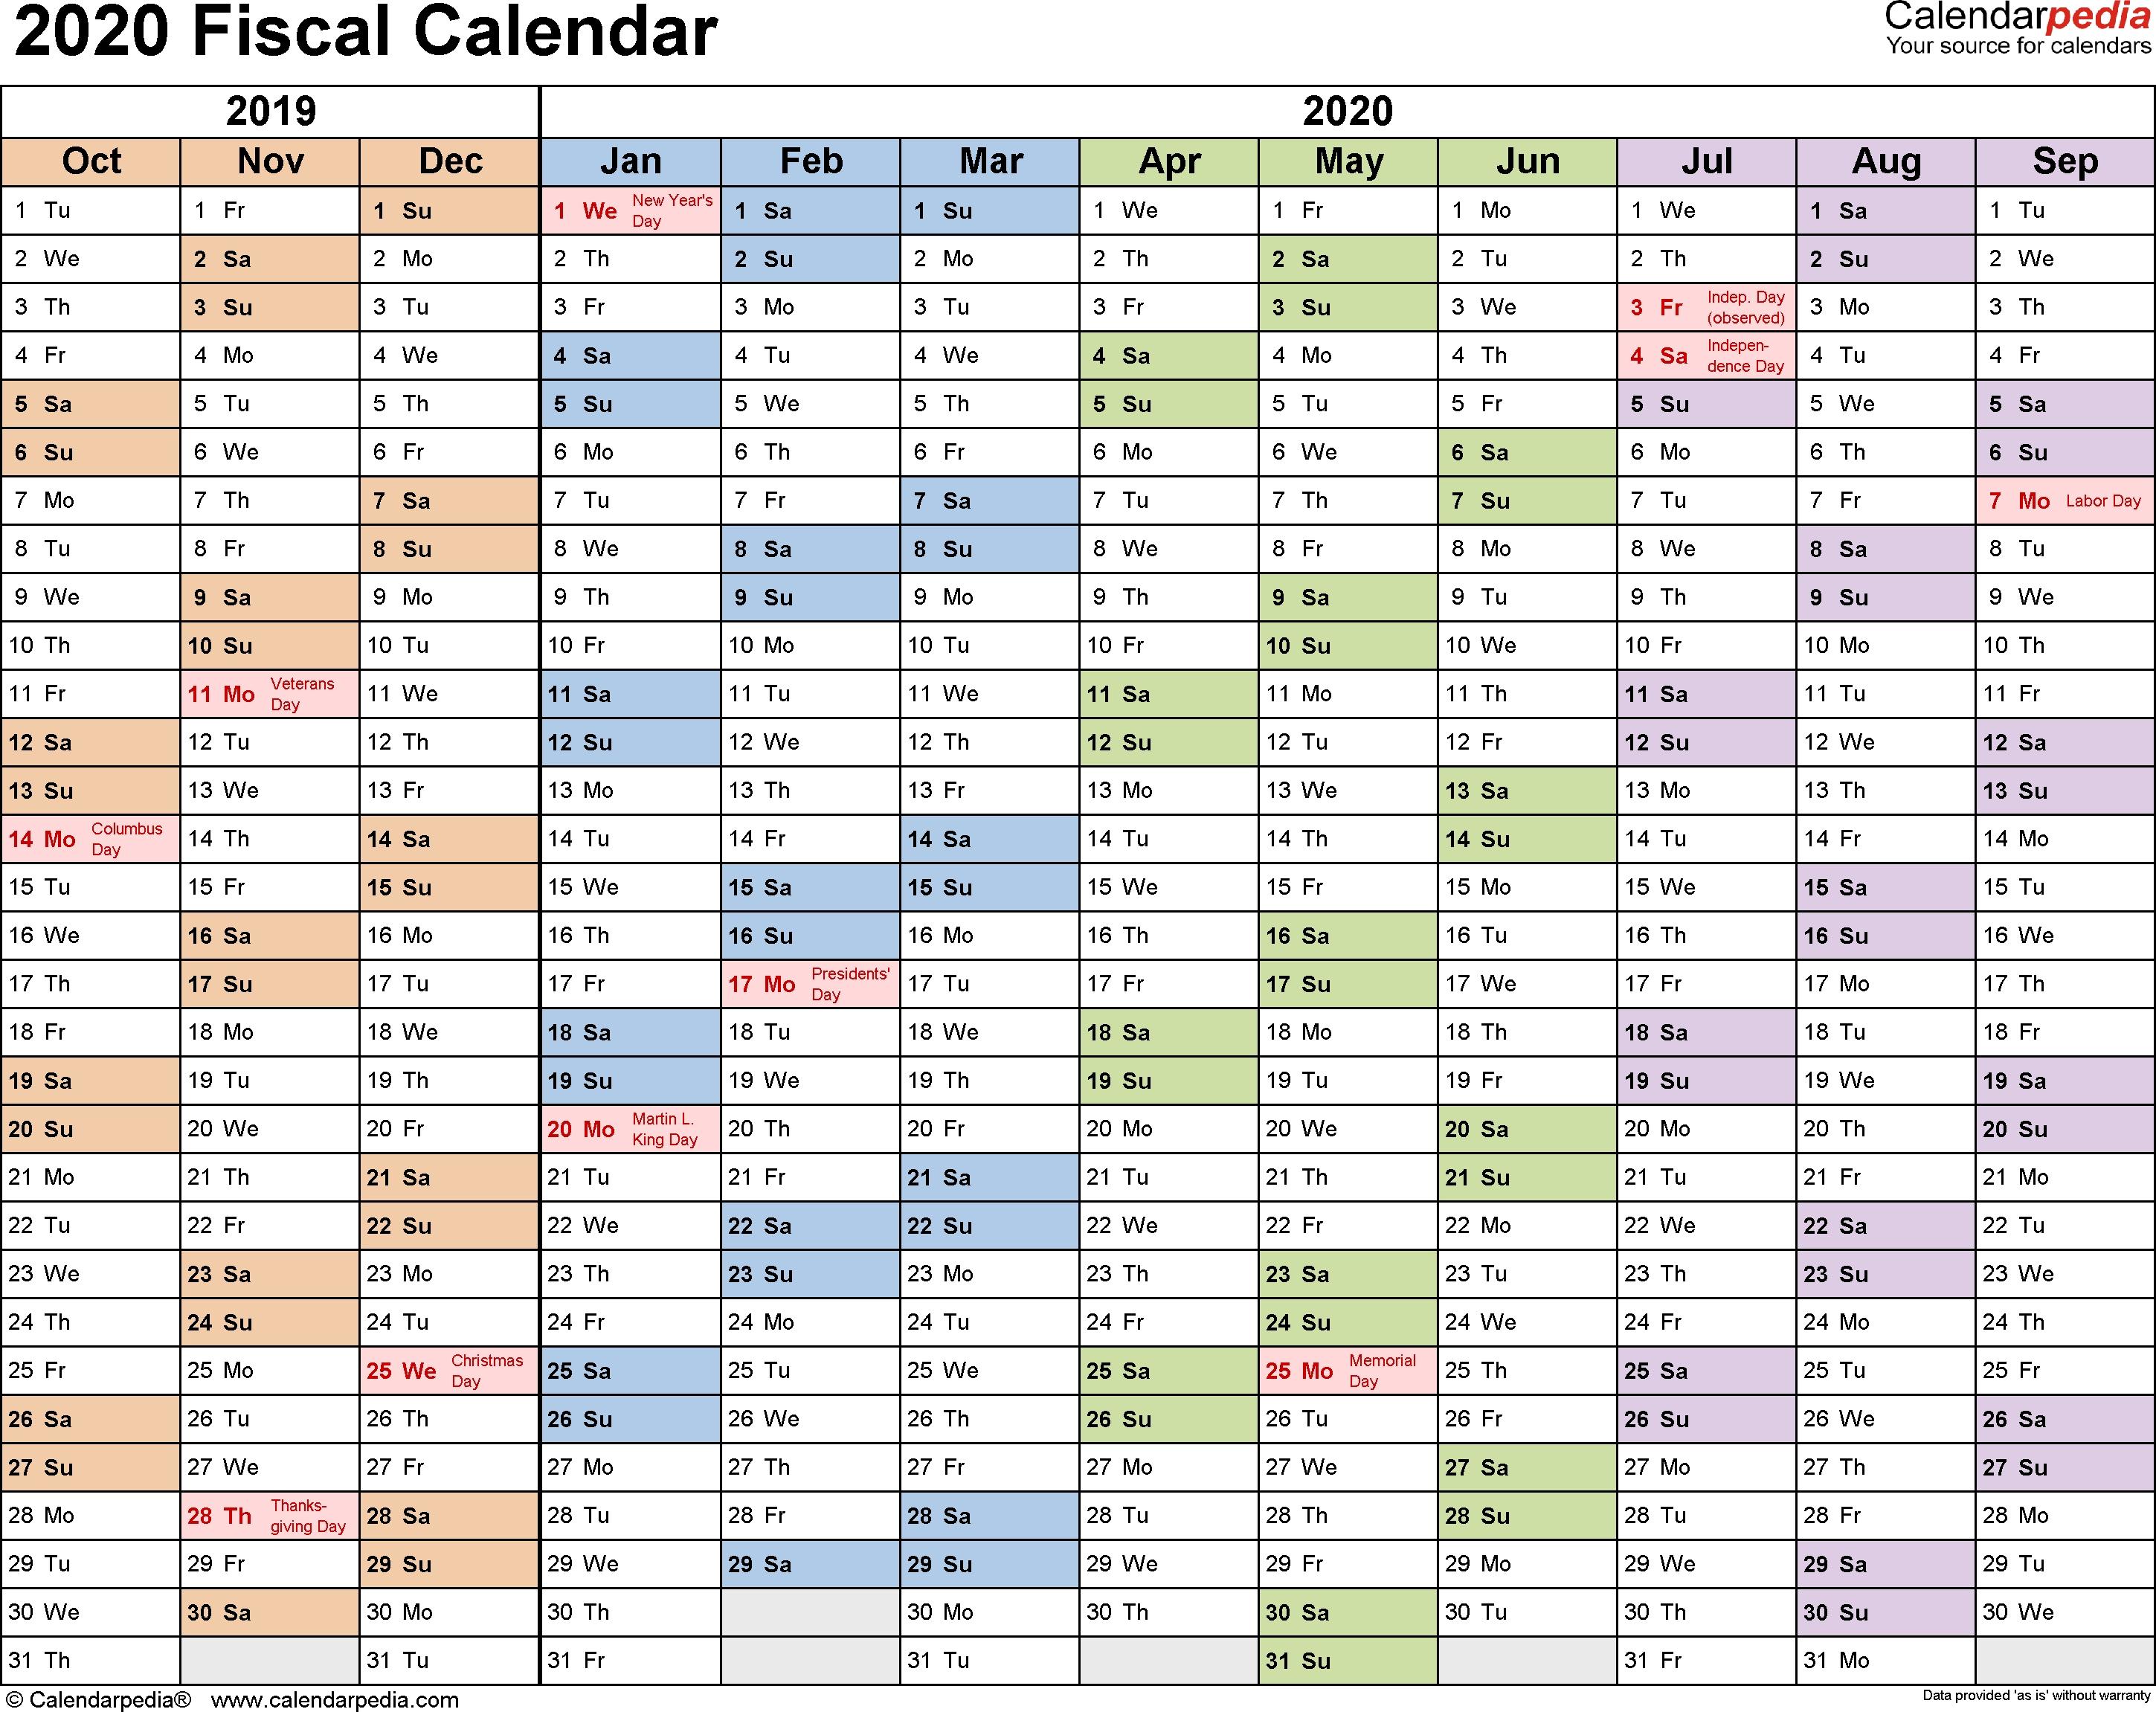 Fiscal Calendars 2020 As Free Printable Pdf Templates 2020 Fiscal Year Calendar